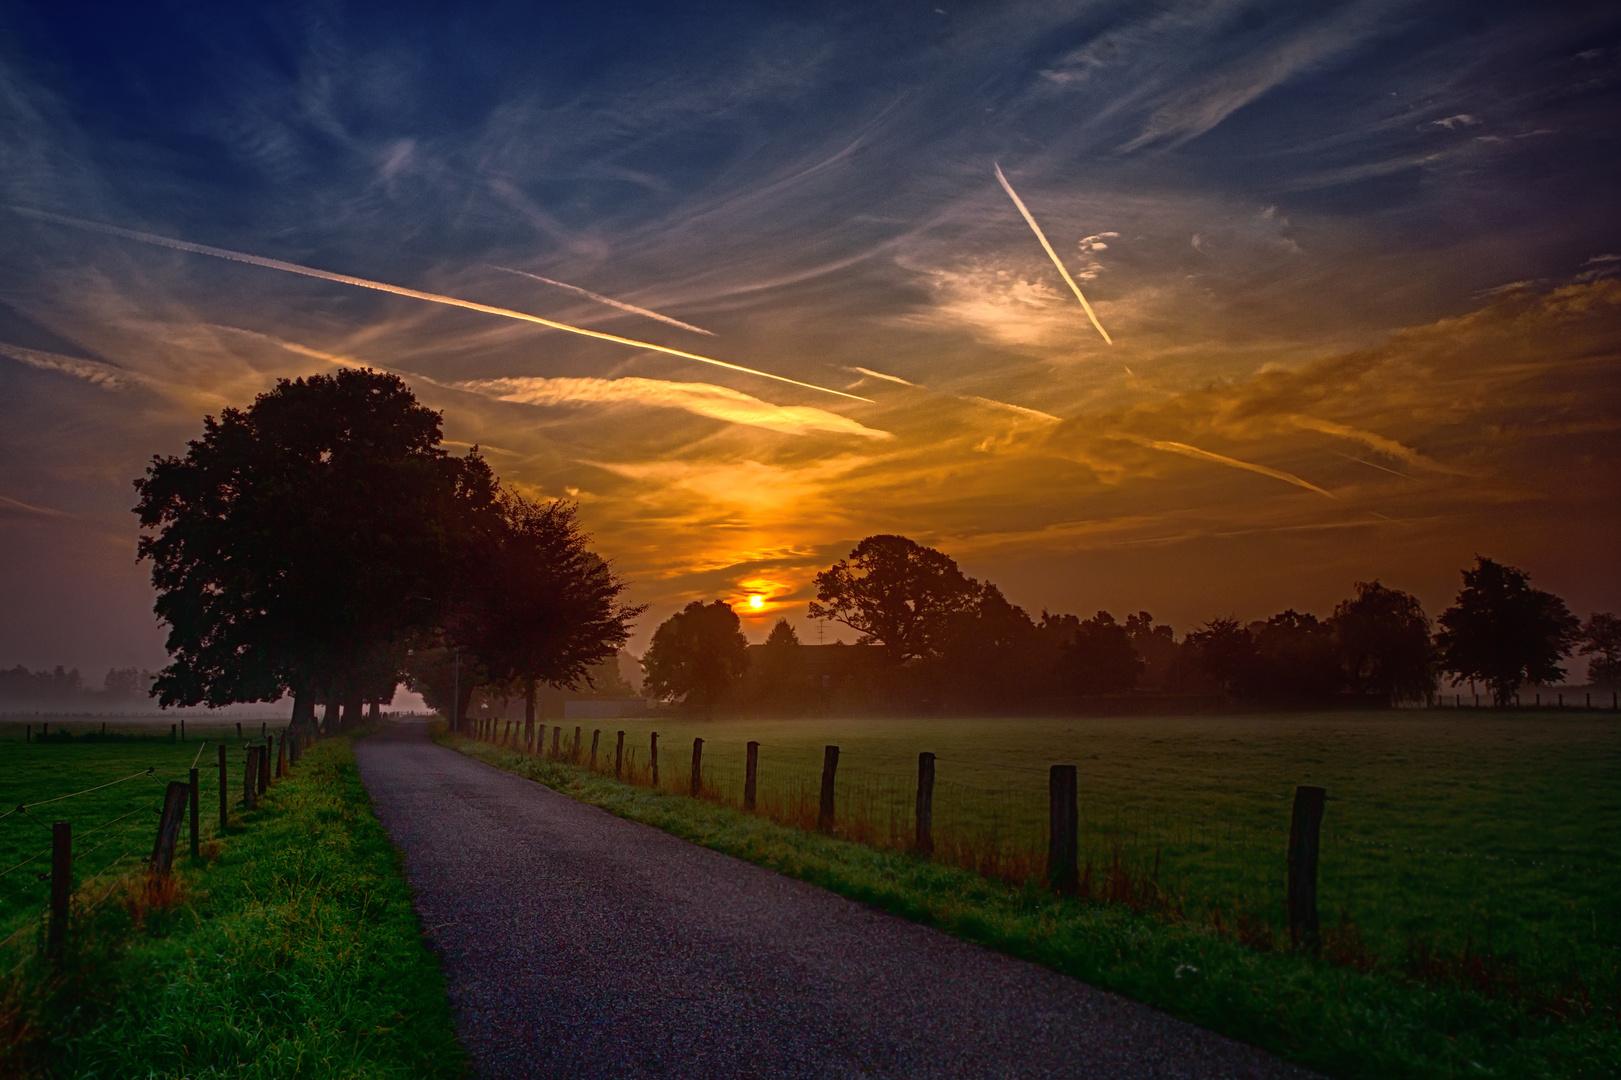 Hartefeld am frühen Morgen